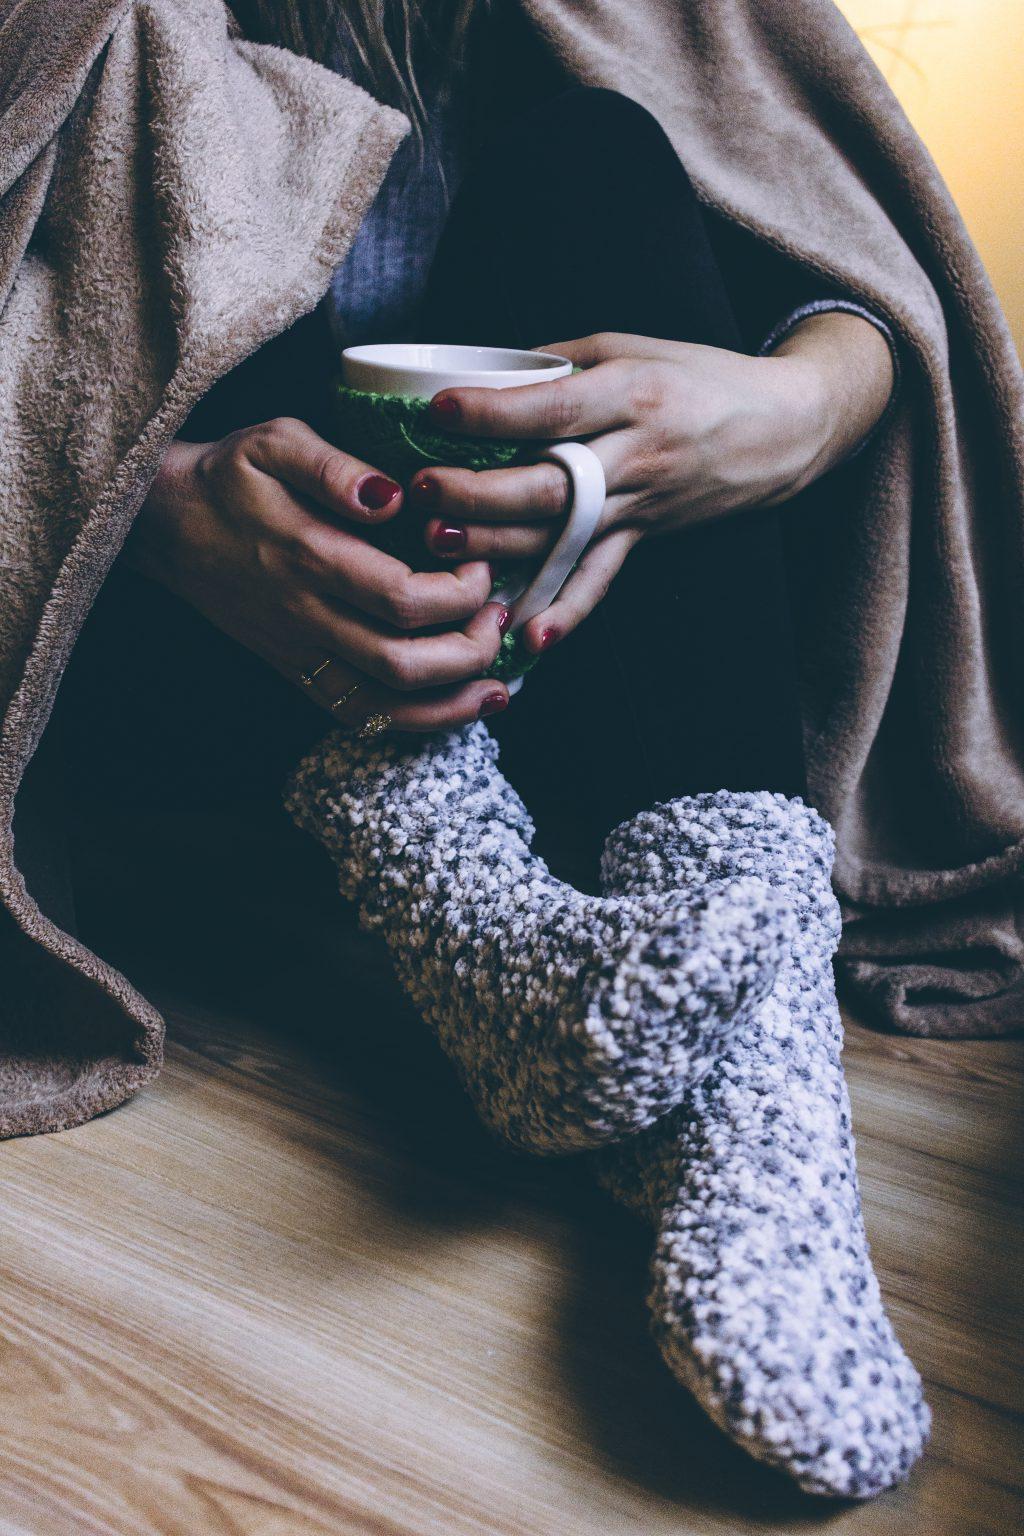 A female in warm socks holding a mug - free stock photo